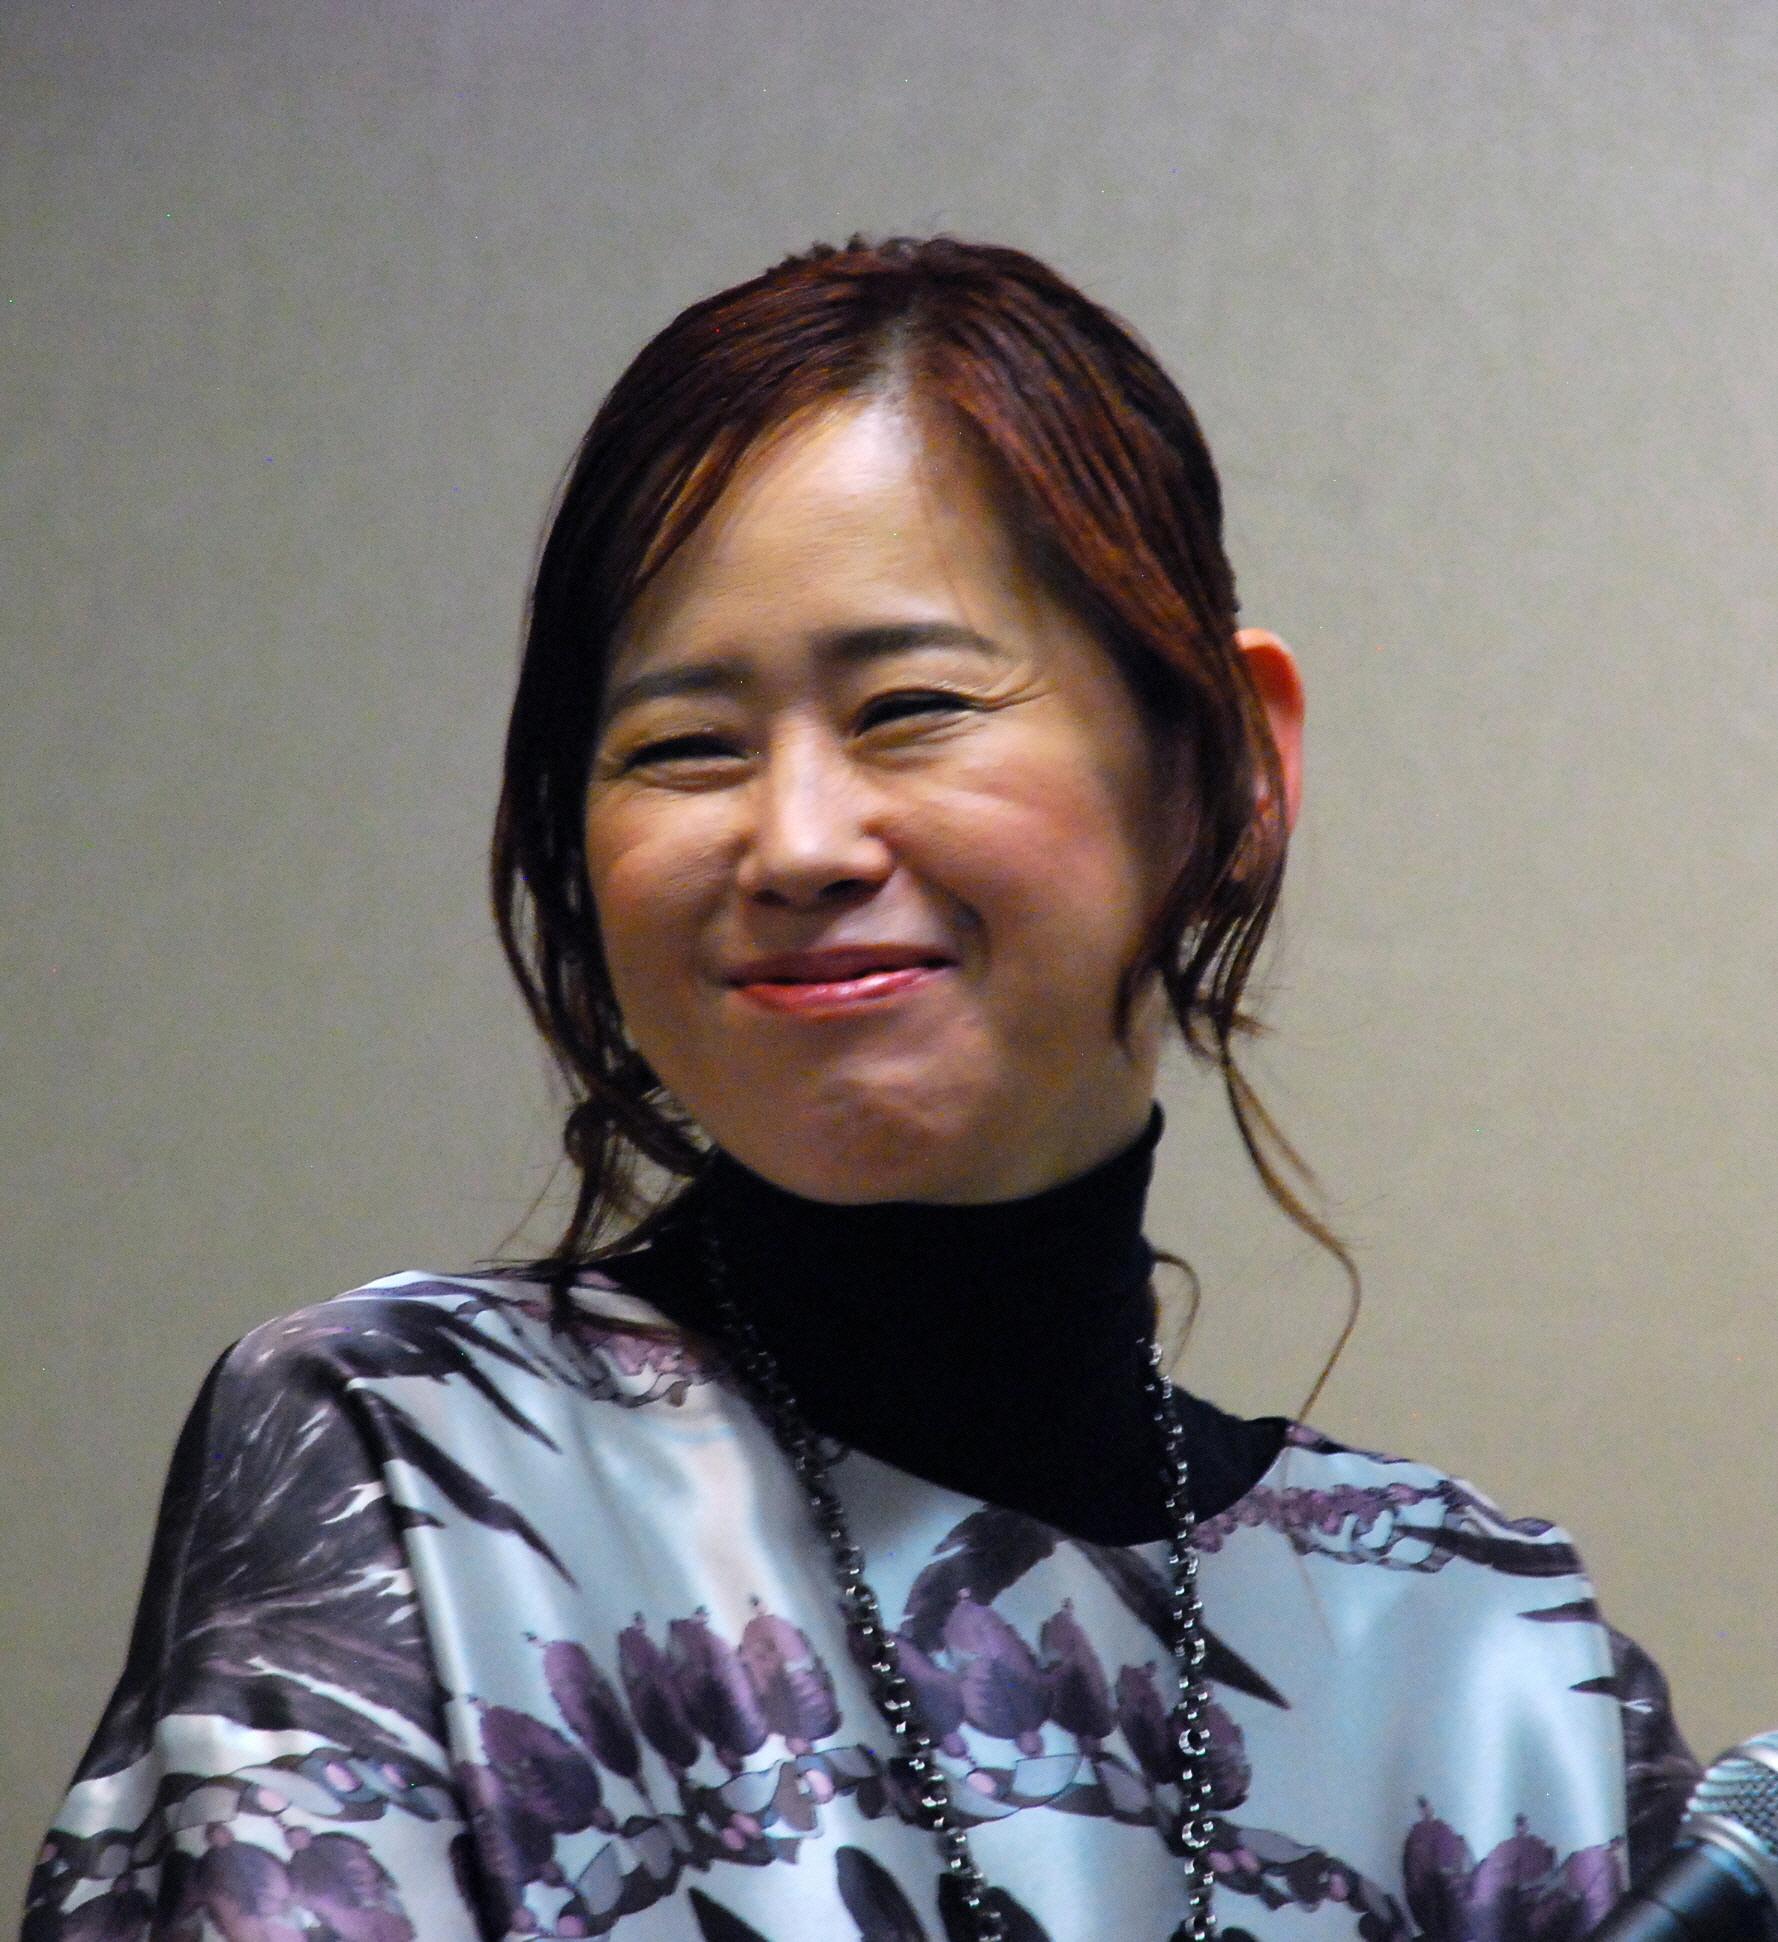 Photo Yuki Kajiura via Opendata BNF